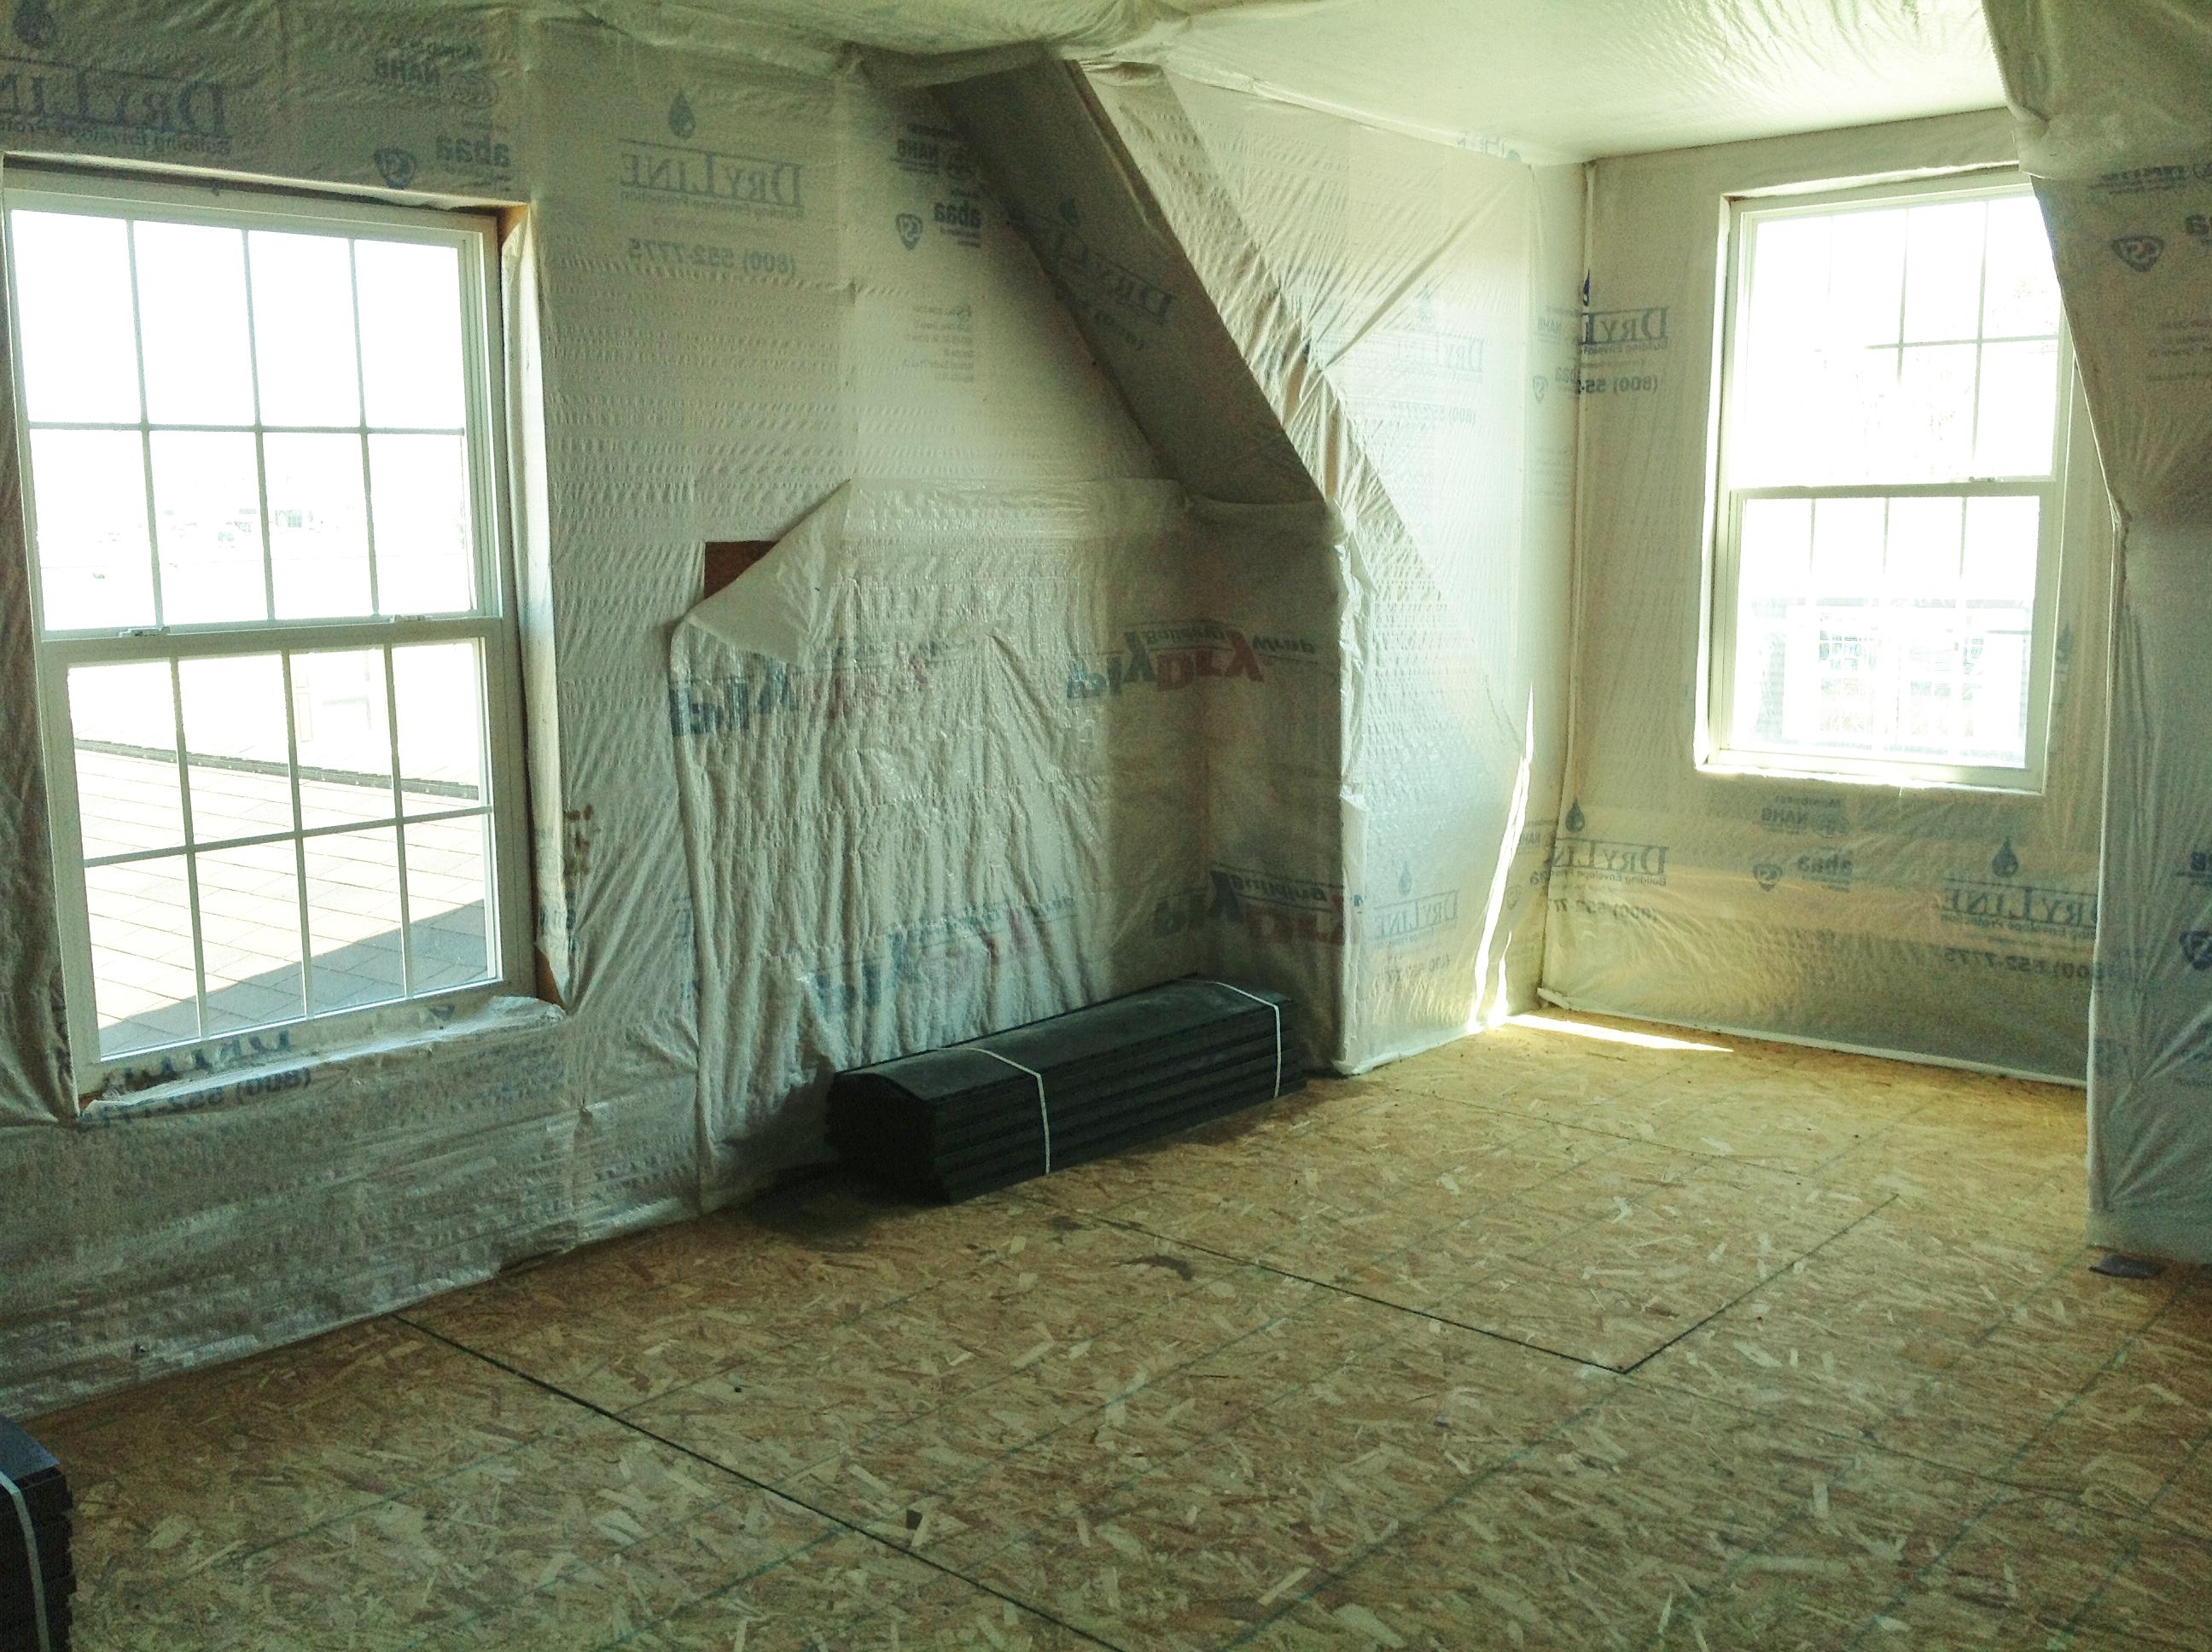 Plenty of room in this attic space.